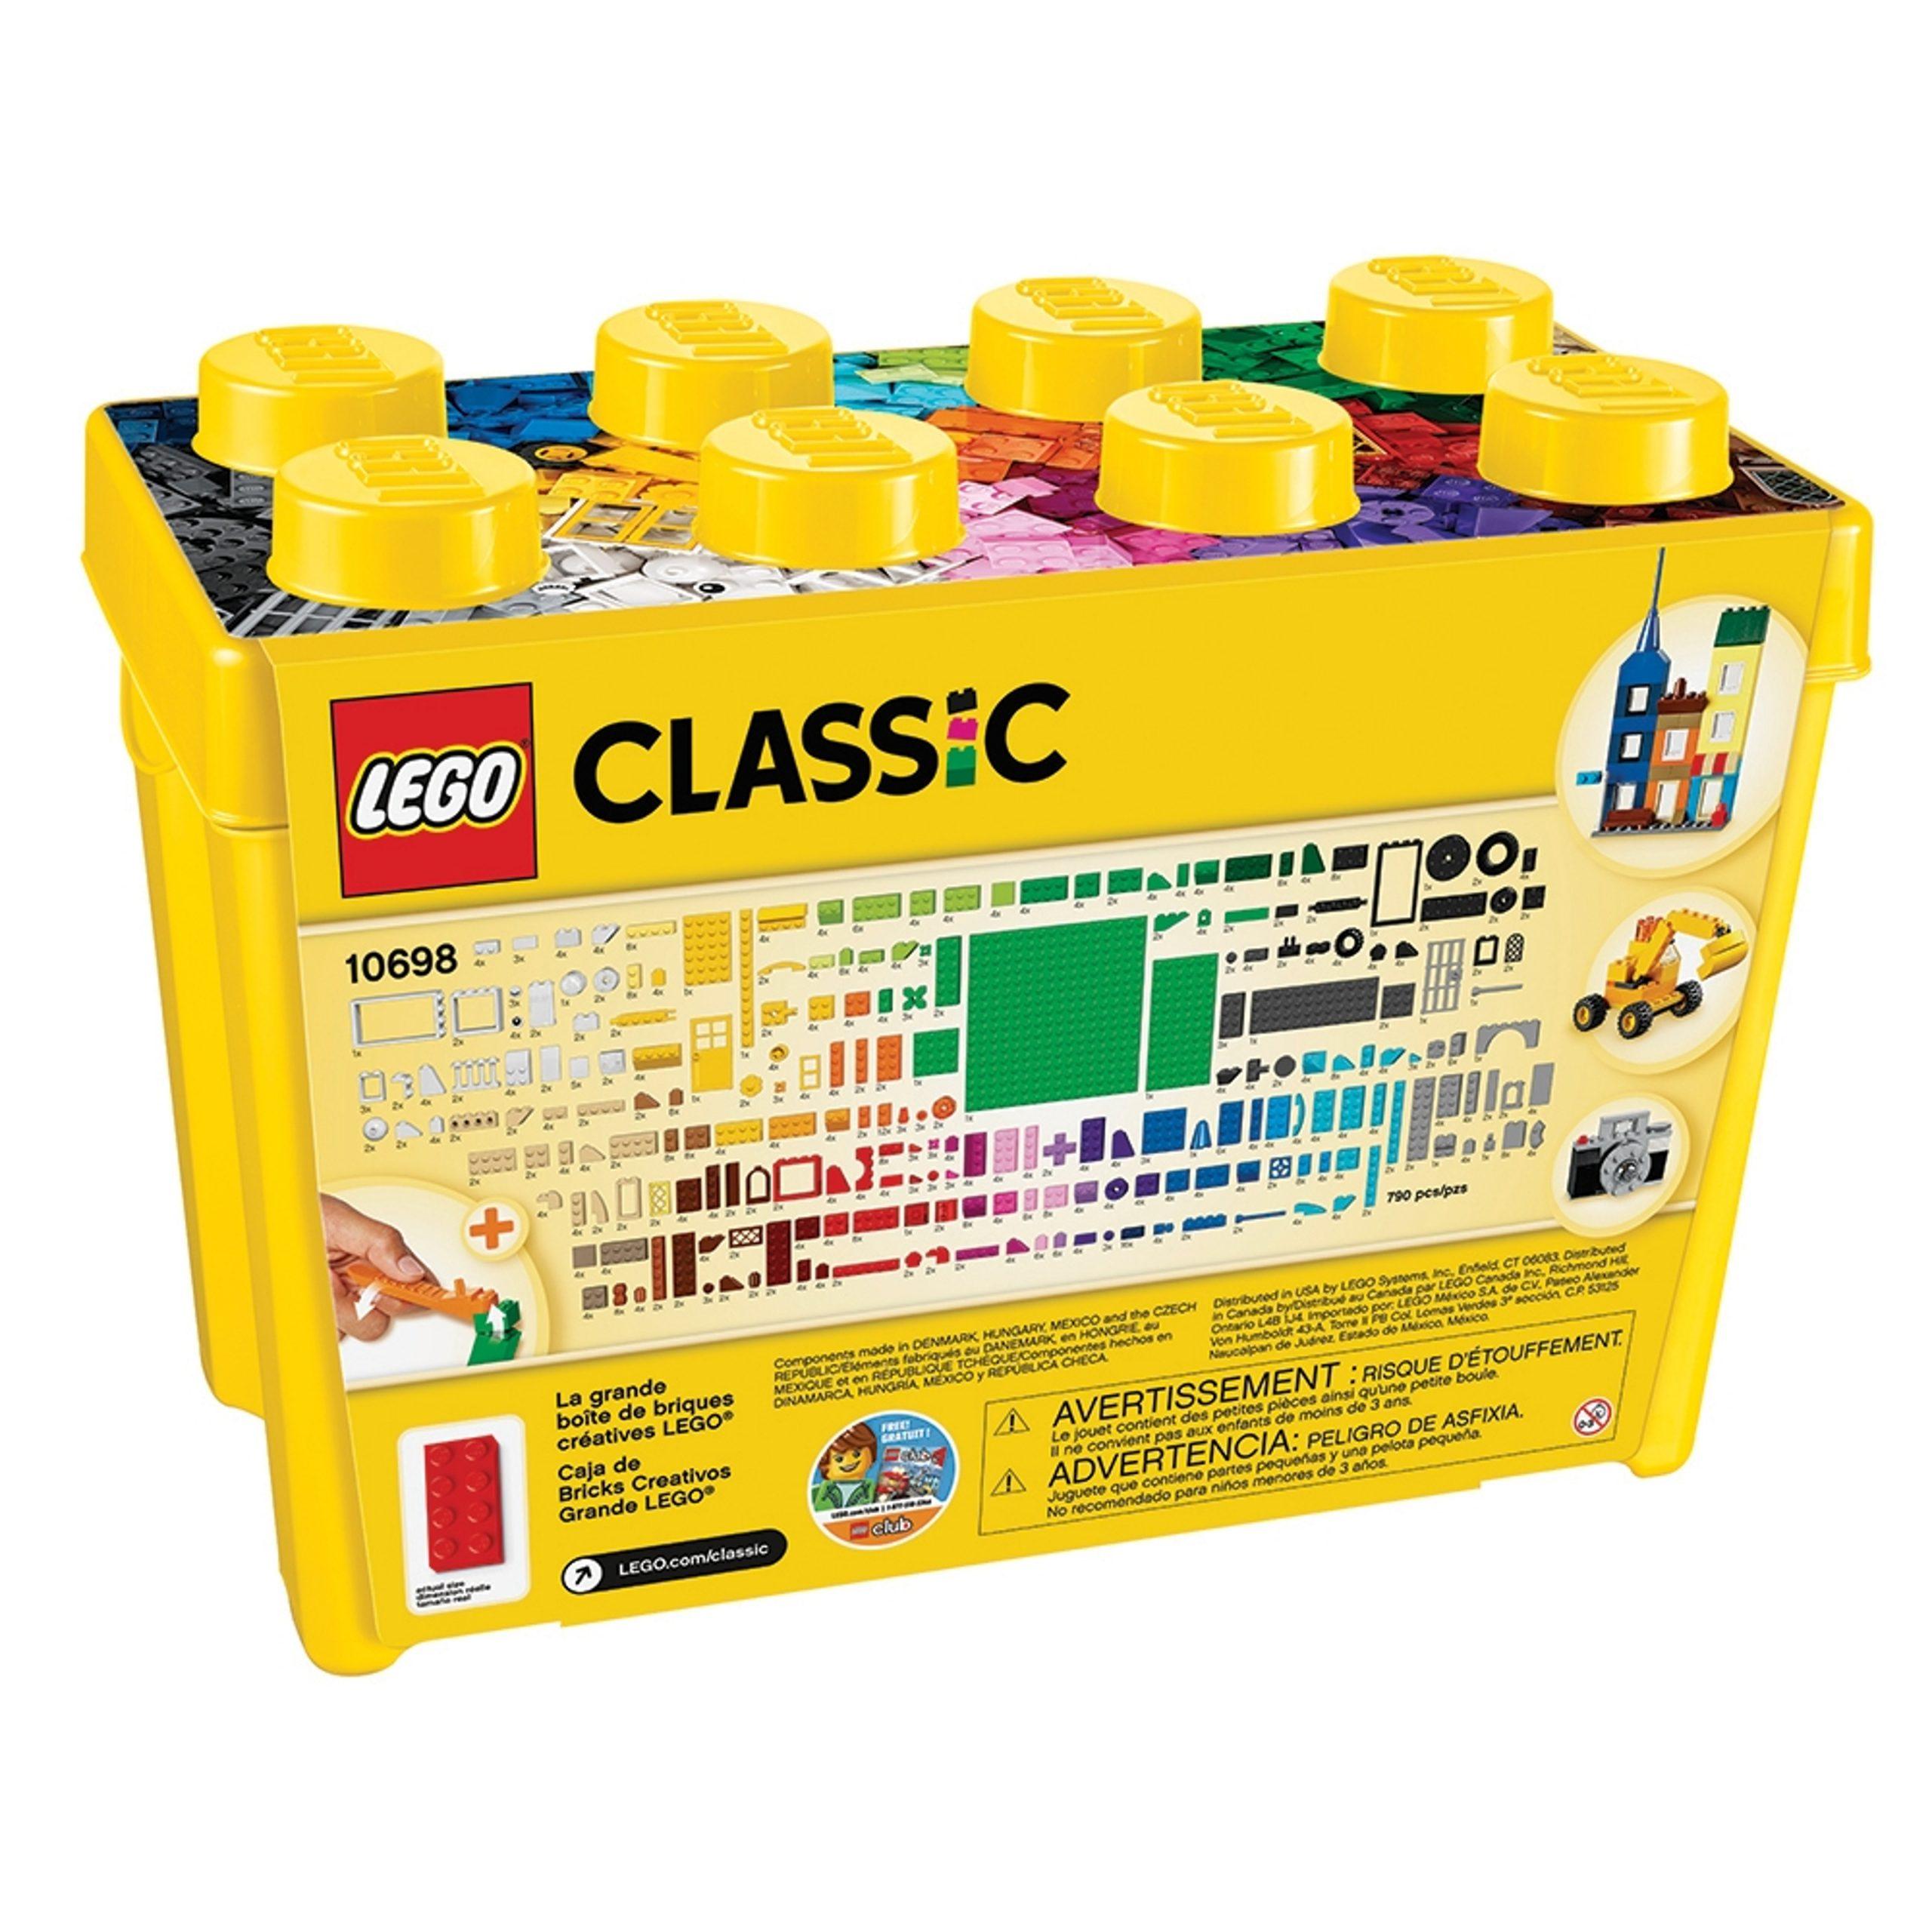 boite de briques creatives deluxe lego 10698 scaled